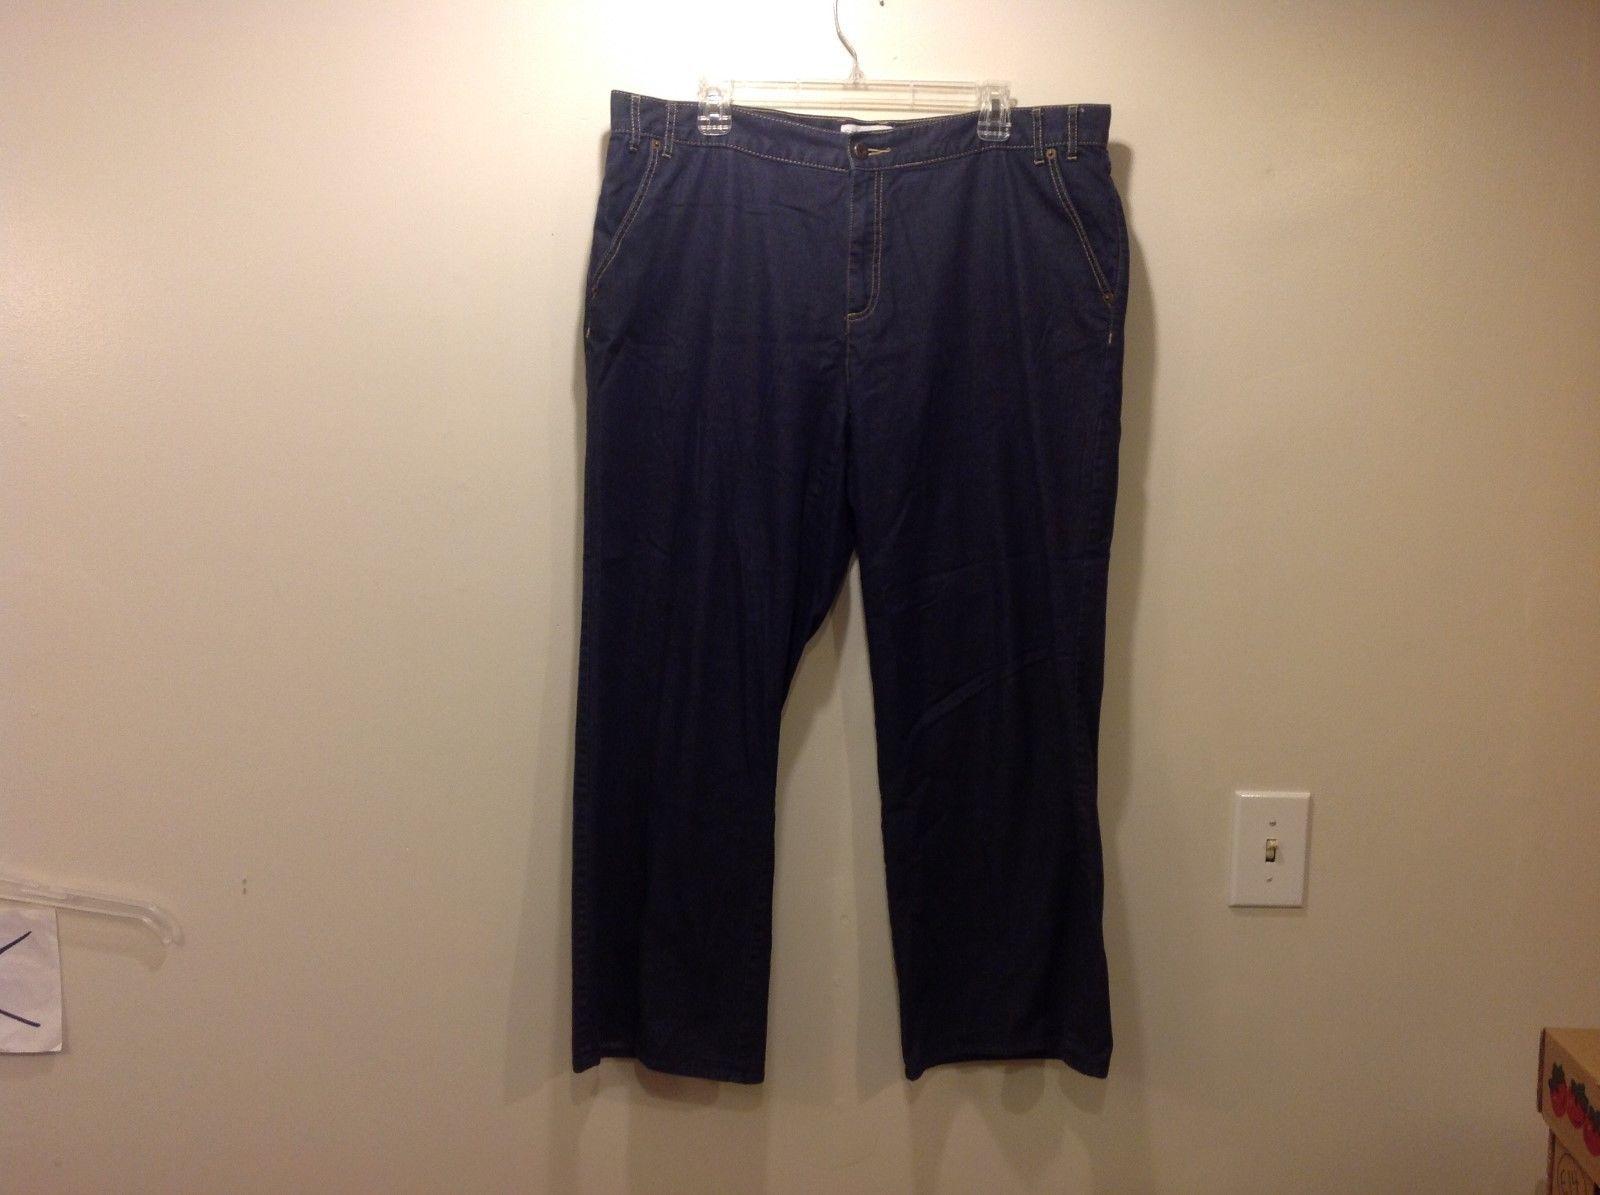 Sag Harbor Dark Jeans Sz 18W